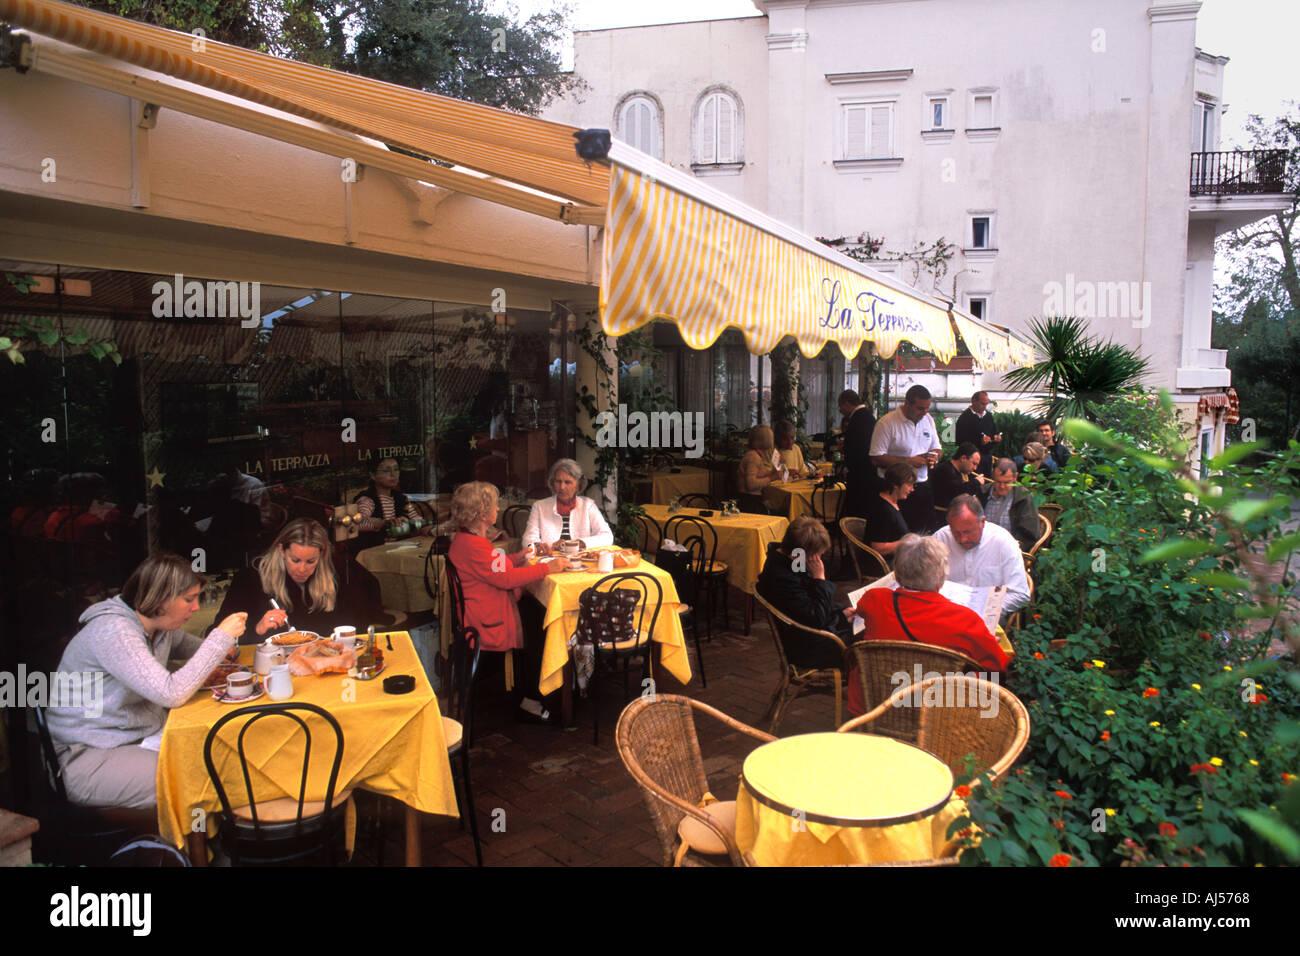 Famous Isle of Capri in Italy and the La Terrazza Restaurant Stock ...